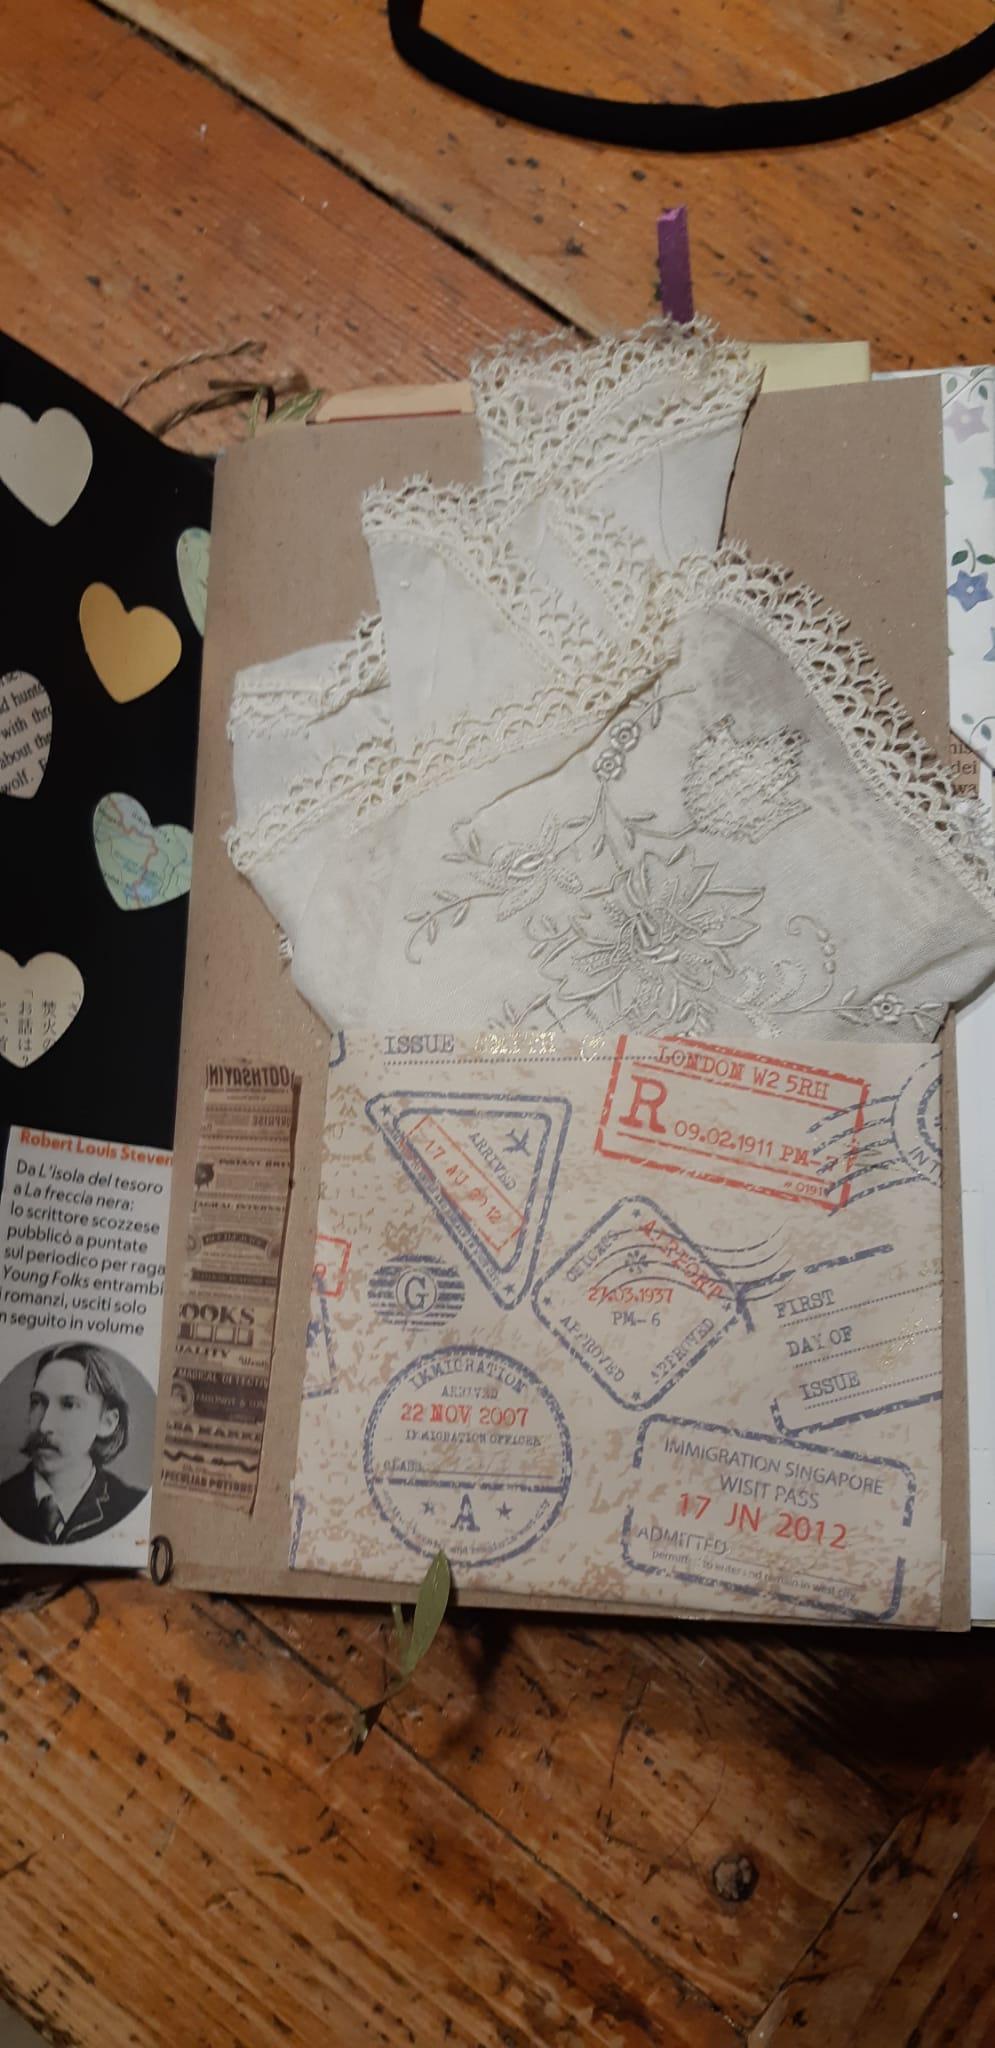 Junk Journal: memories - image 6 - student project